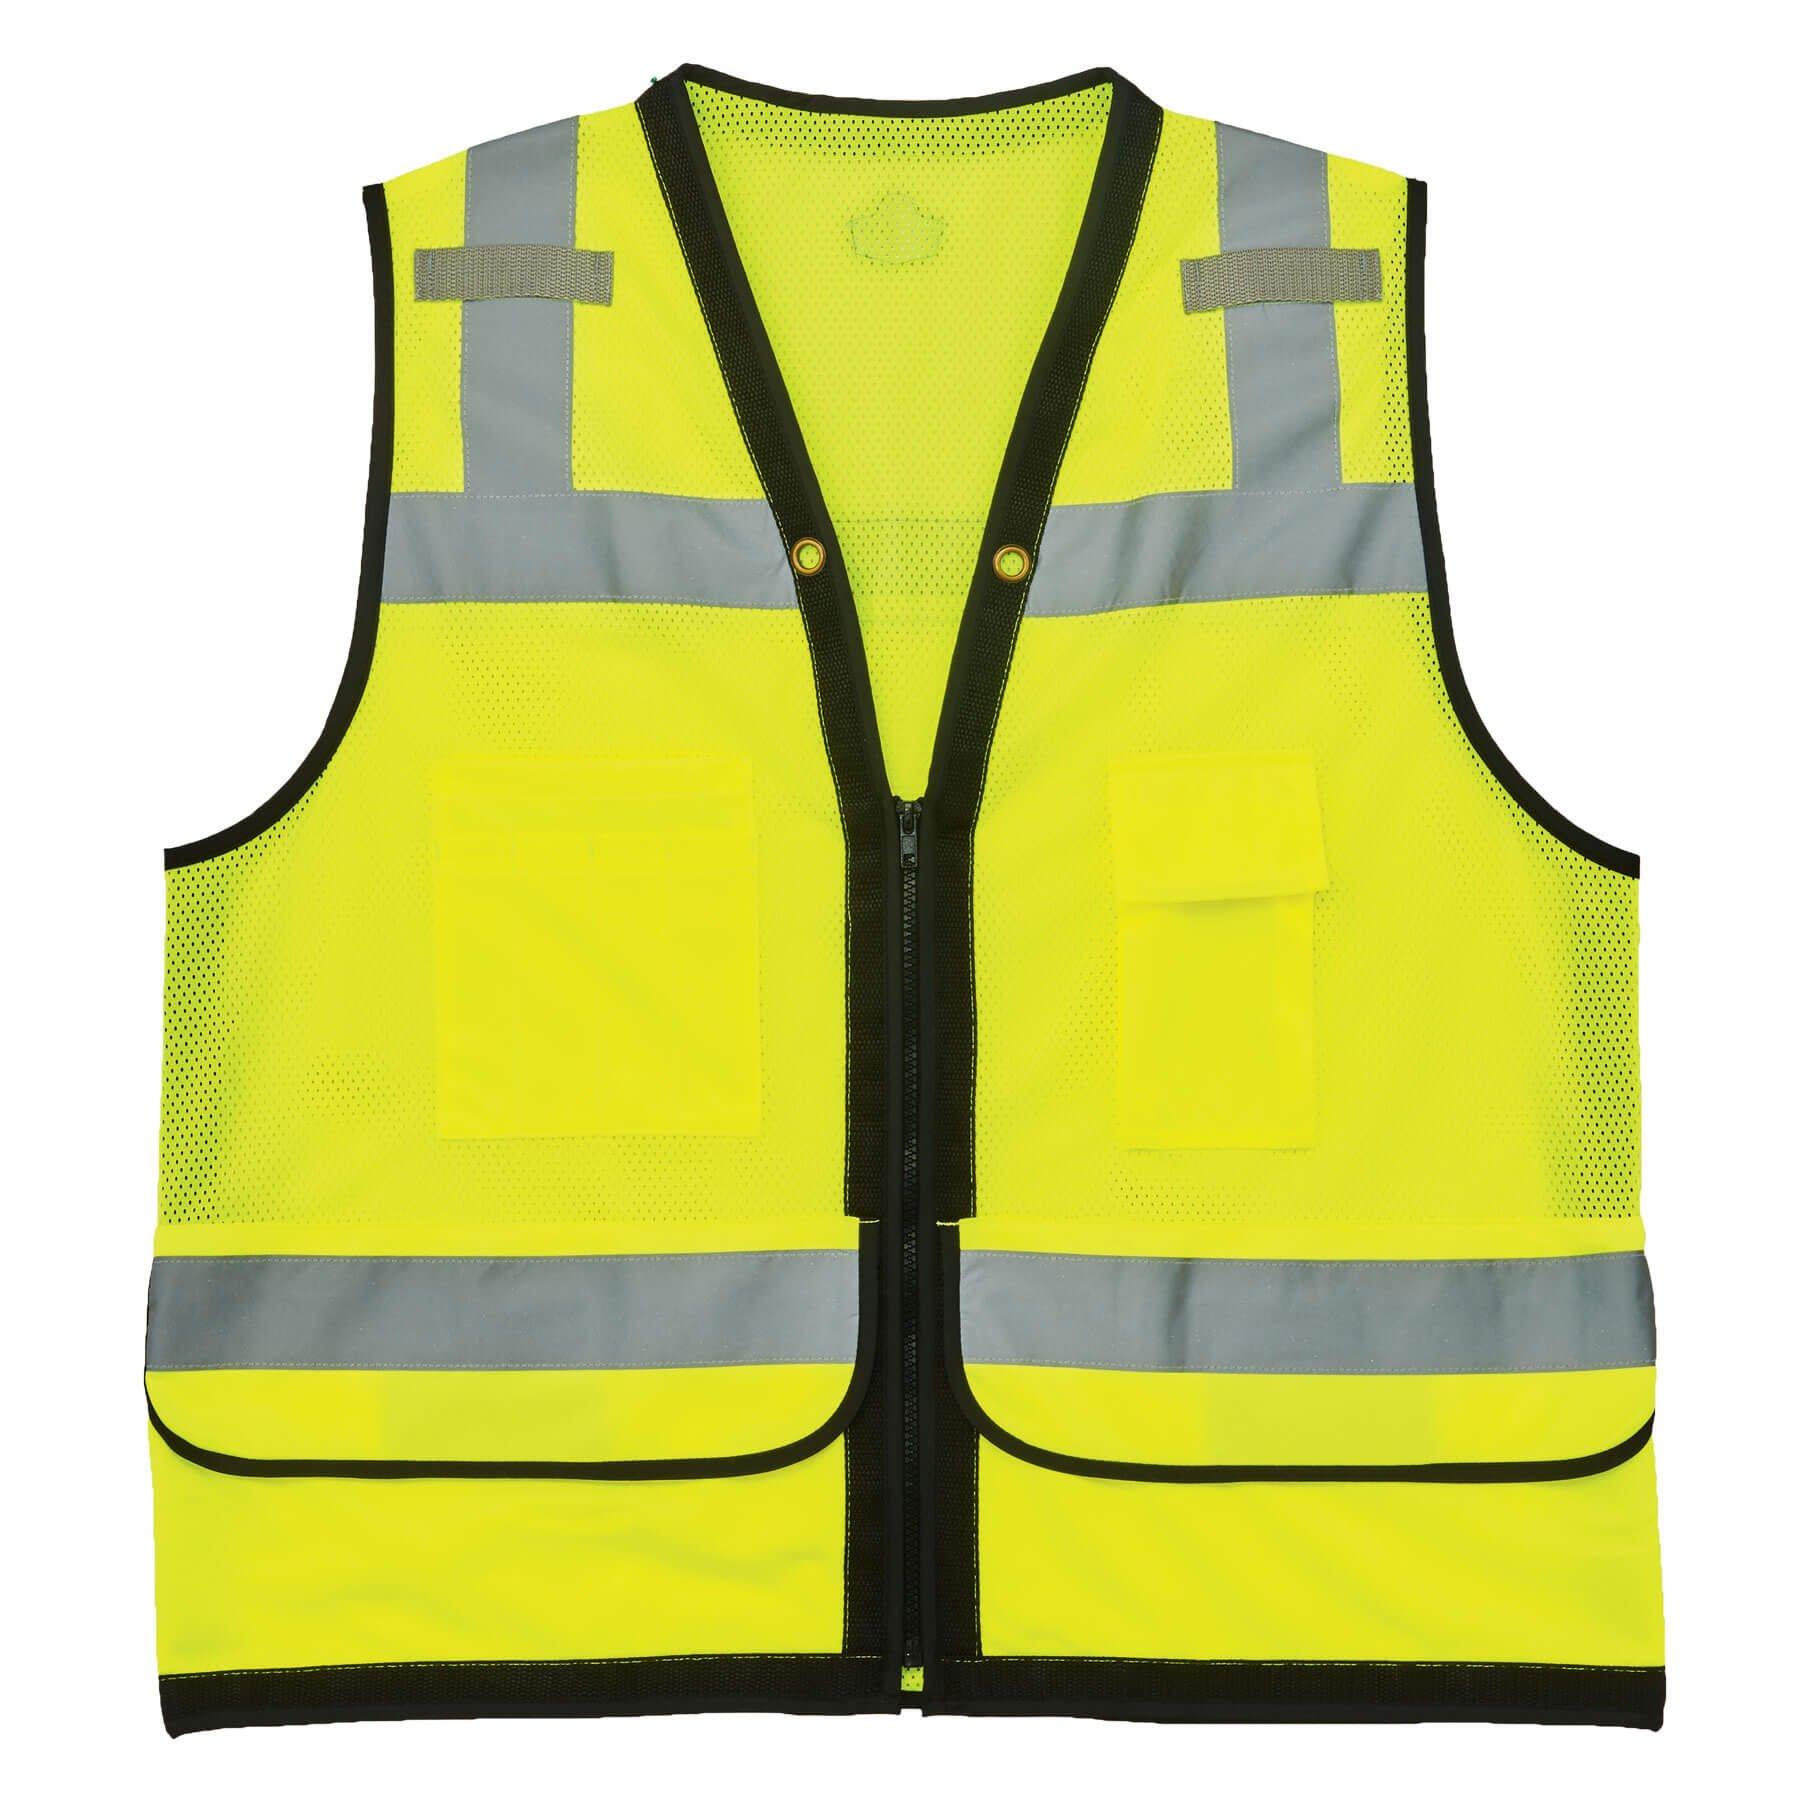 Ergodyne GloWear 8253HDZ ANSI High Visibility Heavy-Duty Mesh Surveyors Reflective Safety Vest, Lime, 4X-Large/5X-Large